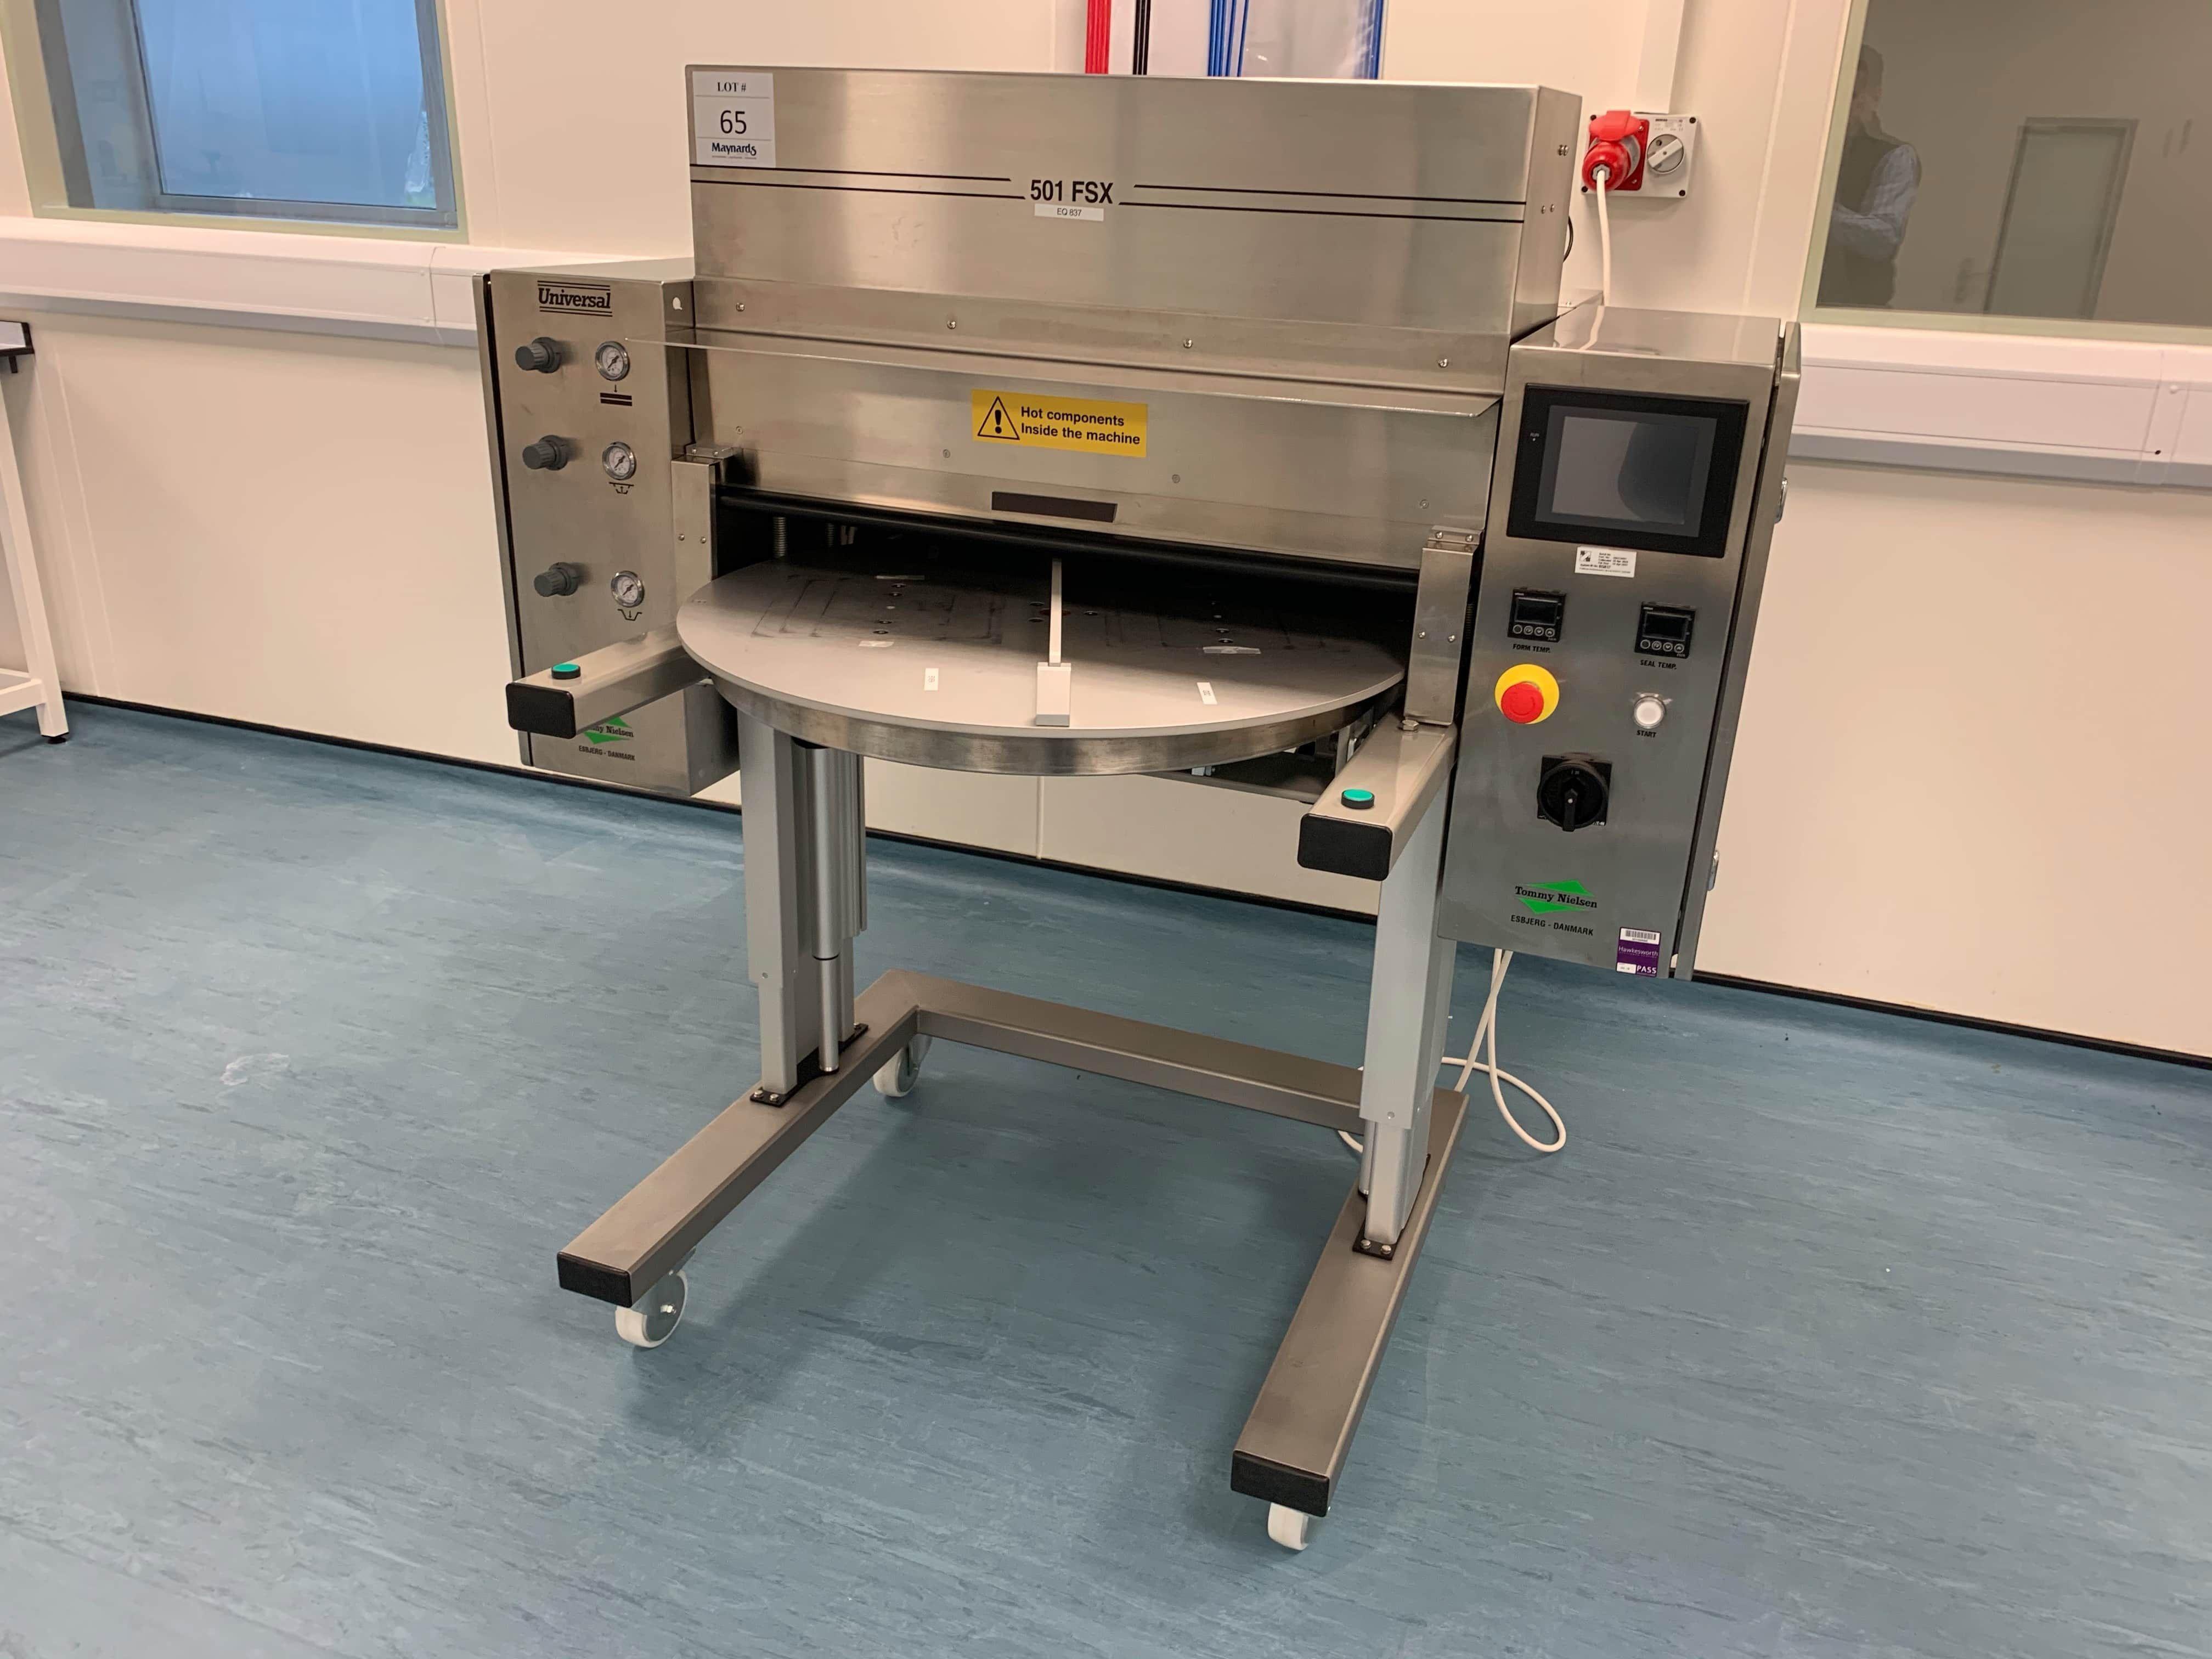 Tommy Nielsen Universal 501 FSXM Semi-automatic Blister Packaging Machine